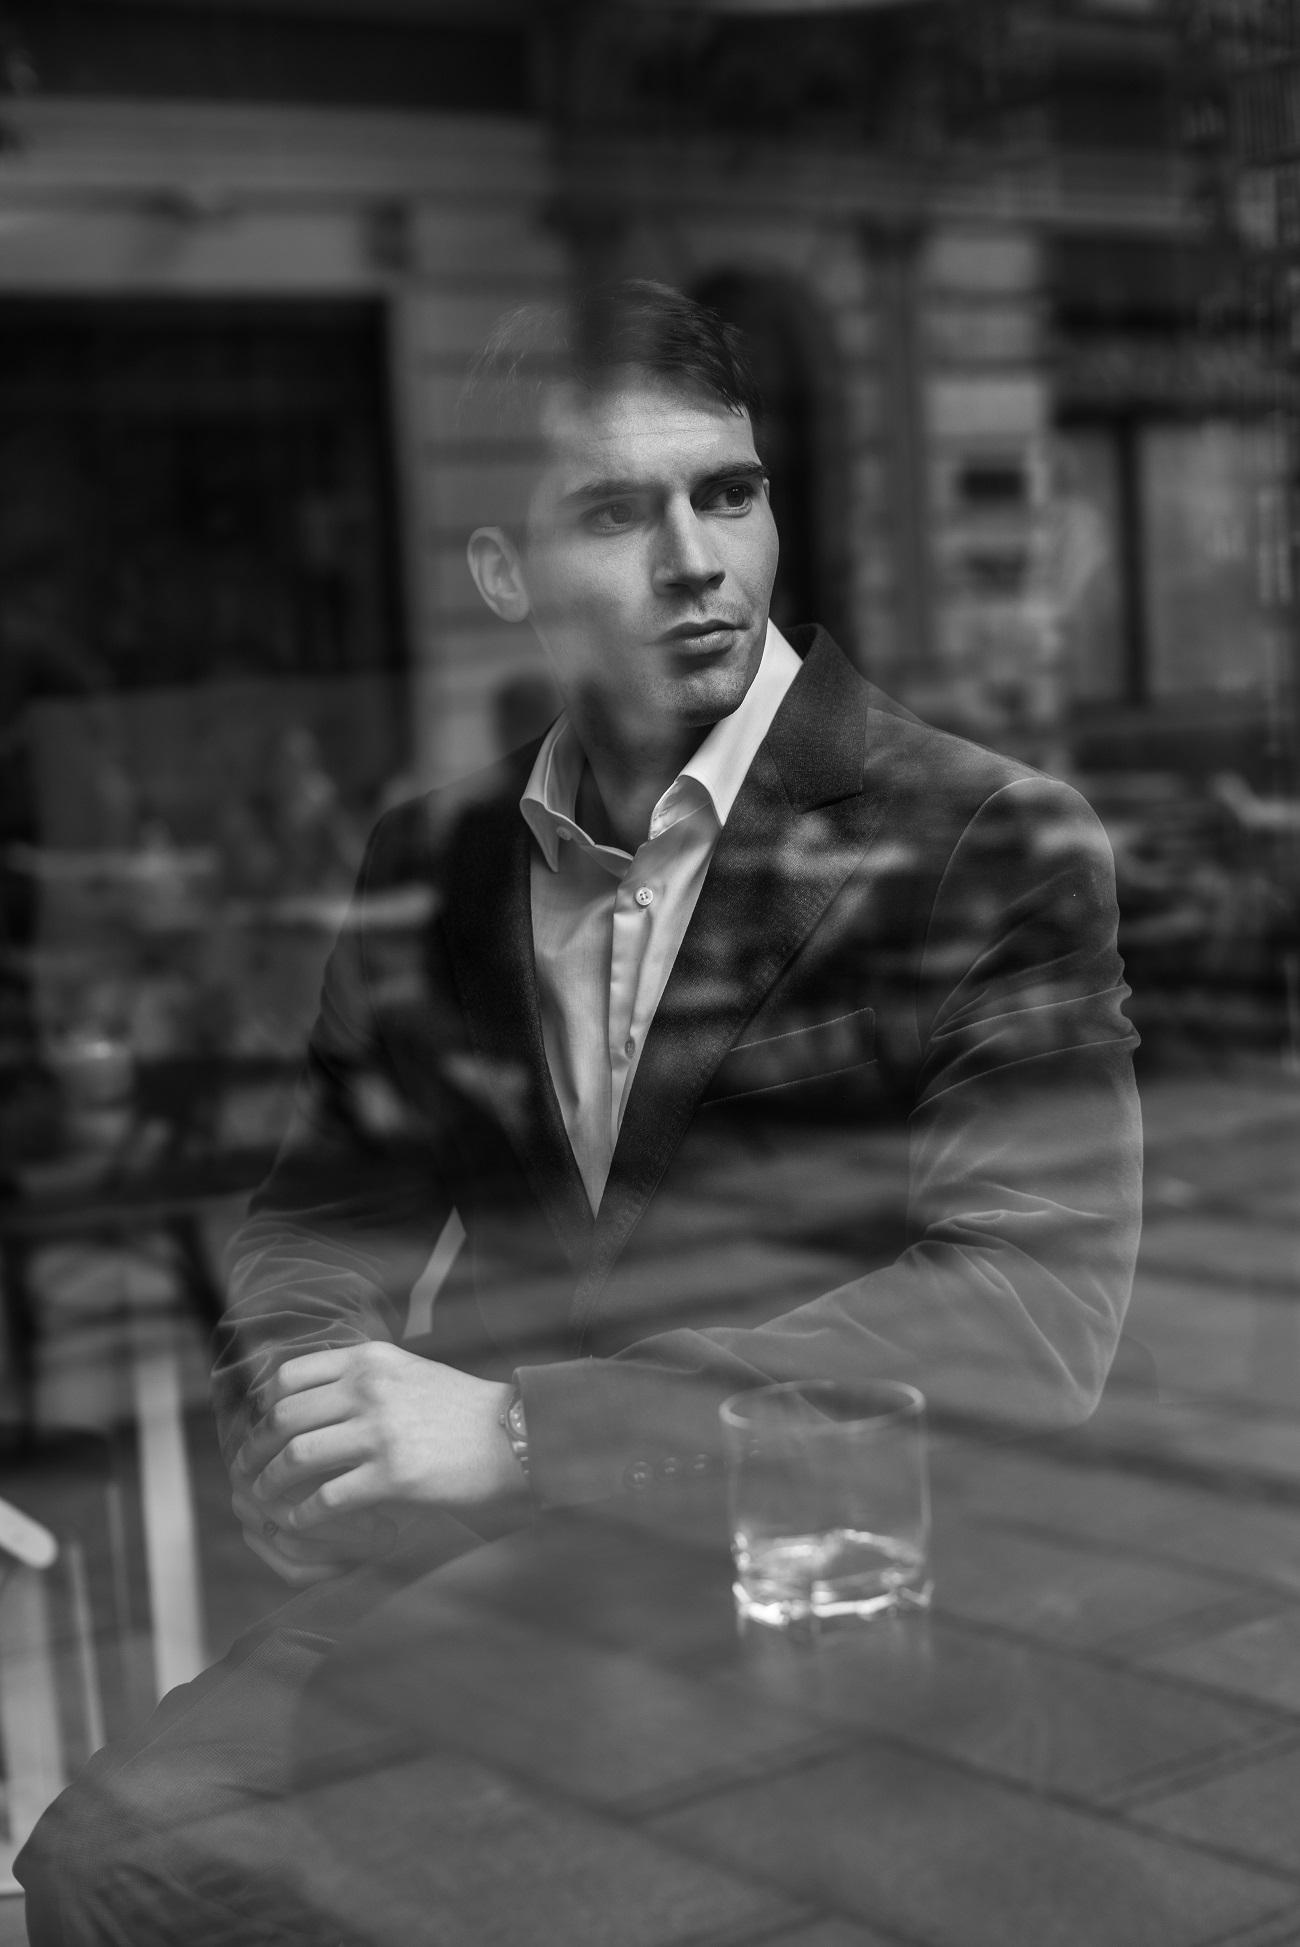 Vukota_Brajovic_wearing_Valter_by_Brana Peric_Jack_Sena4